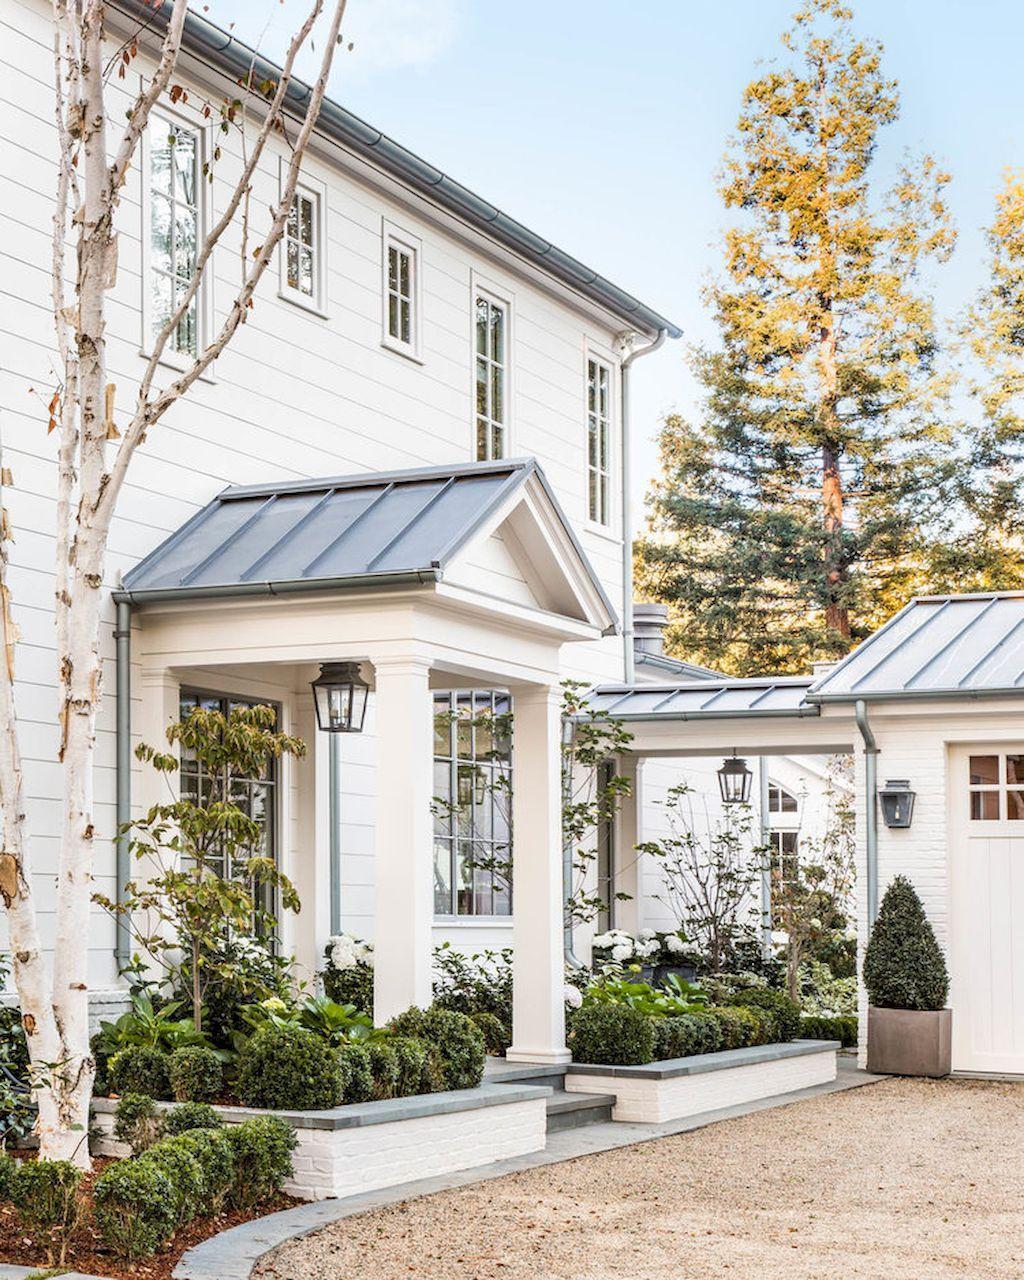 70s Home Exterior Remodel: 70 Stunning Farmhouse Exterior Design Ideas (51